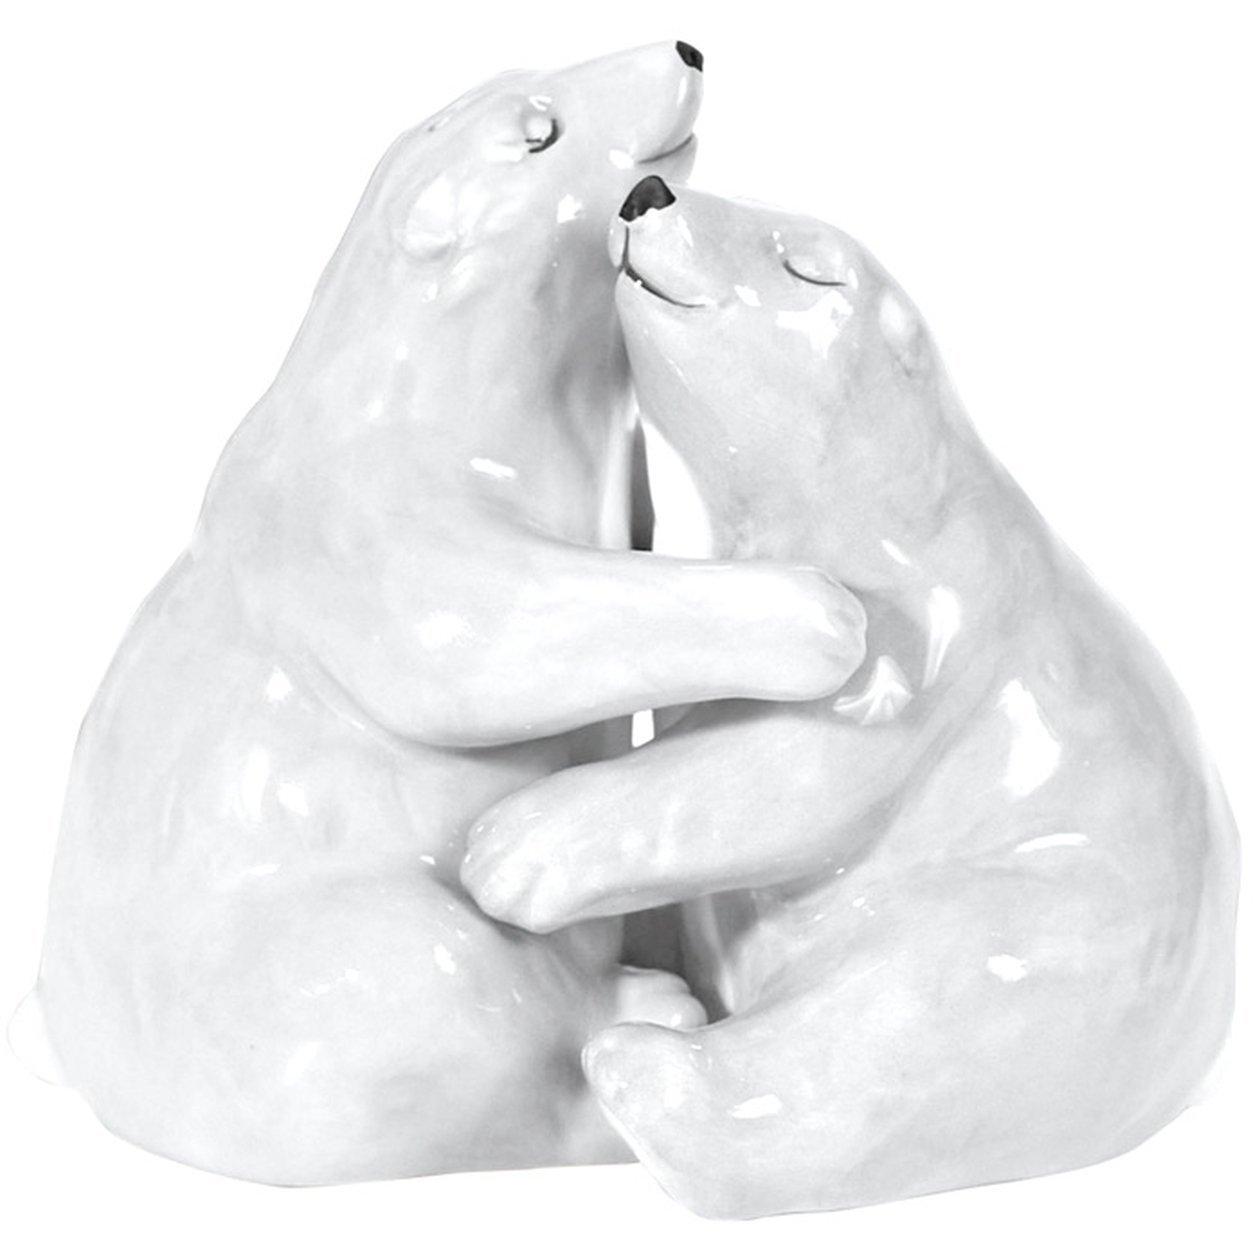 MWAH HUGGING POLAR BEAR COUPLE Salt and Pepper